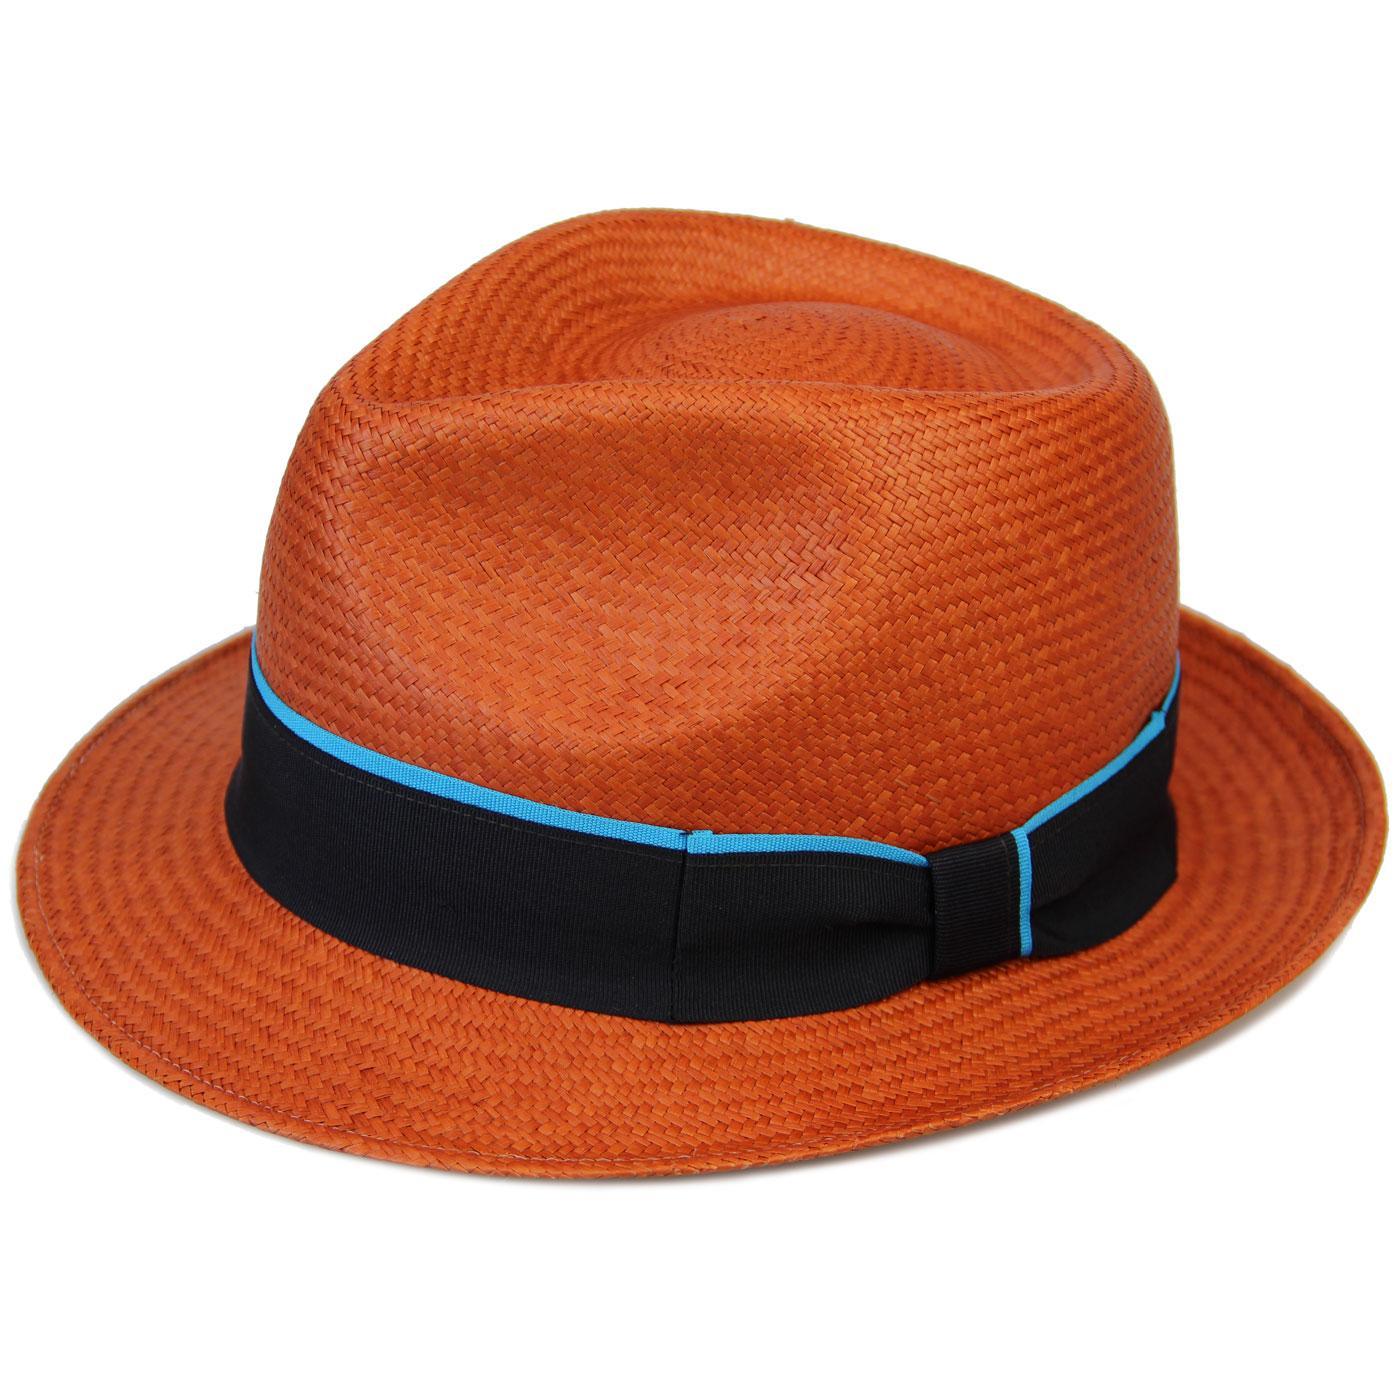 FAILSWORTH Retro Mod Contrast Stripe Panama Hat A